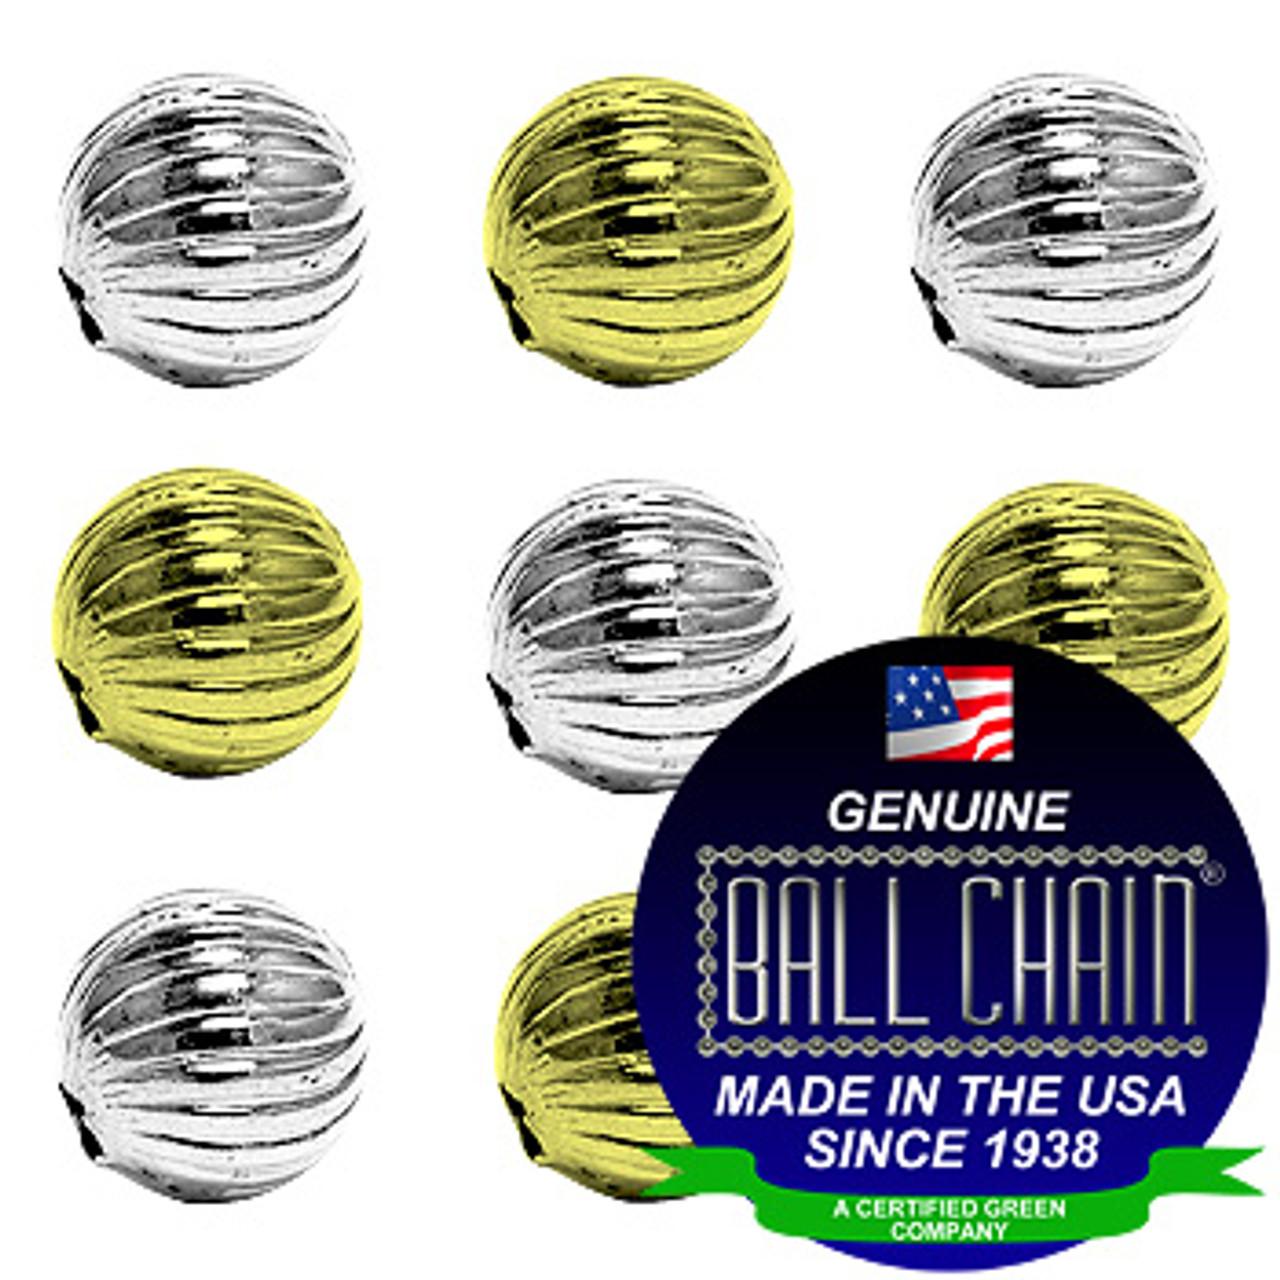 4.0mm Spiral Beads - Nickel Plated Brass, Yellow Brass, or Gilding Metal